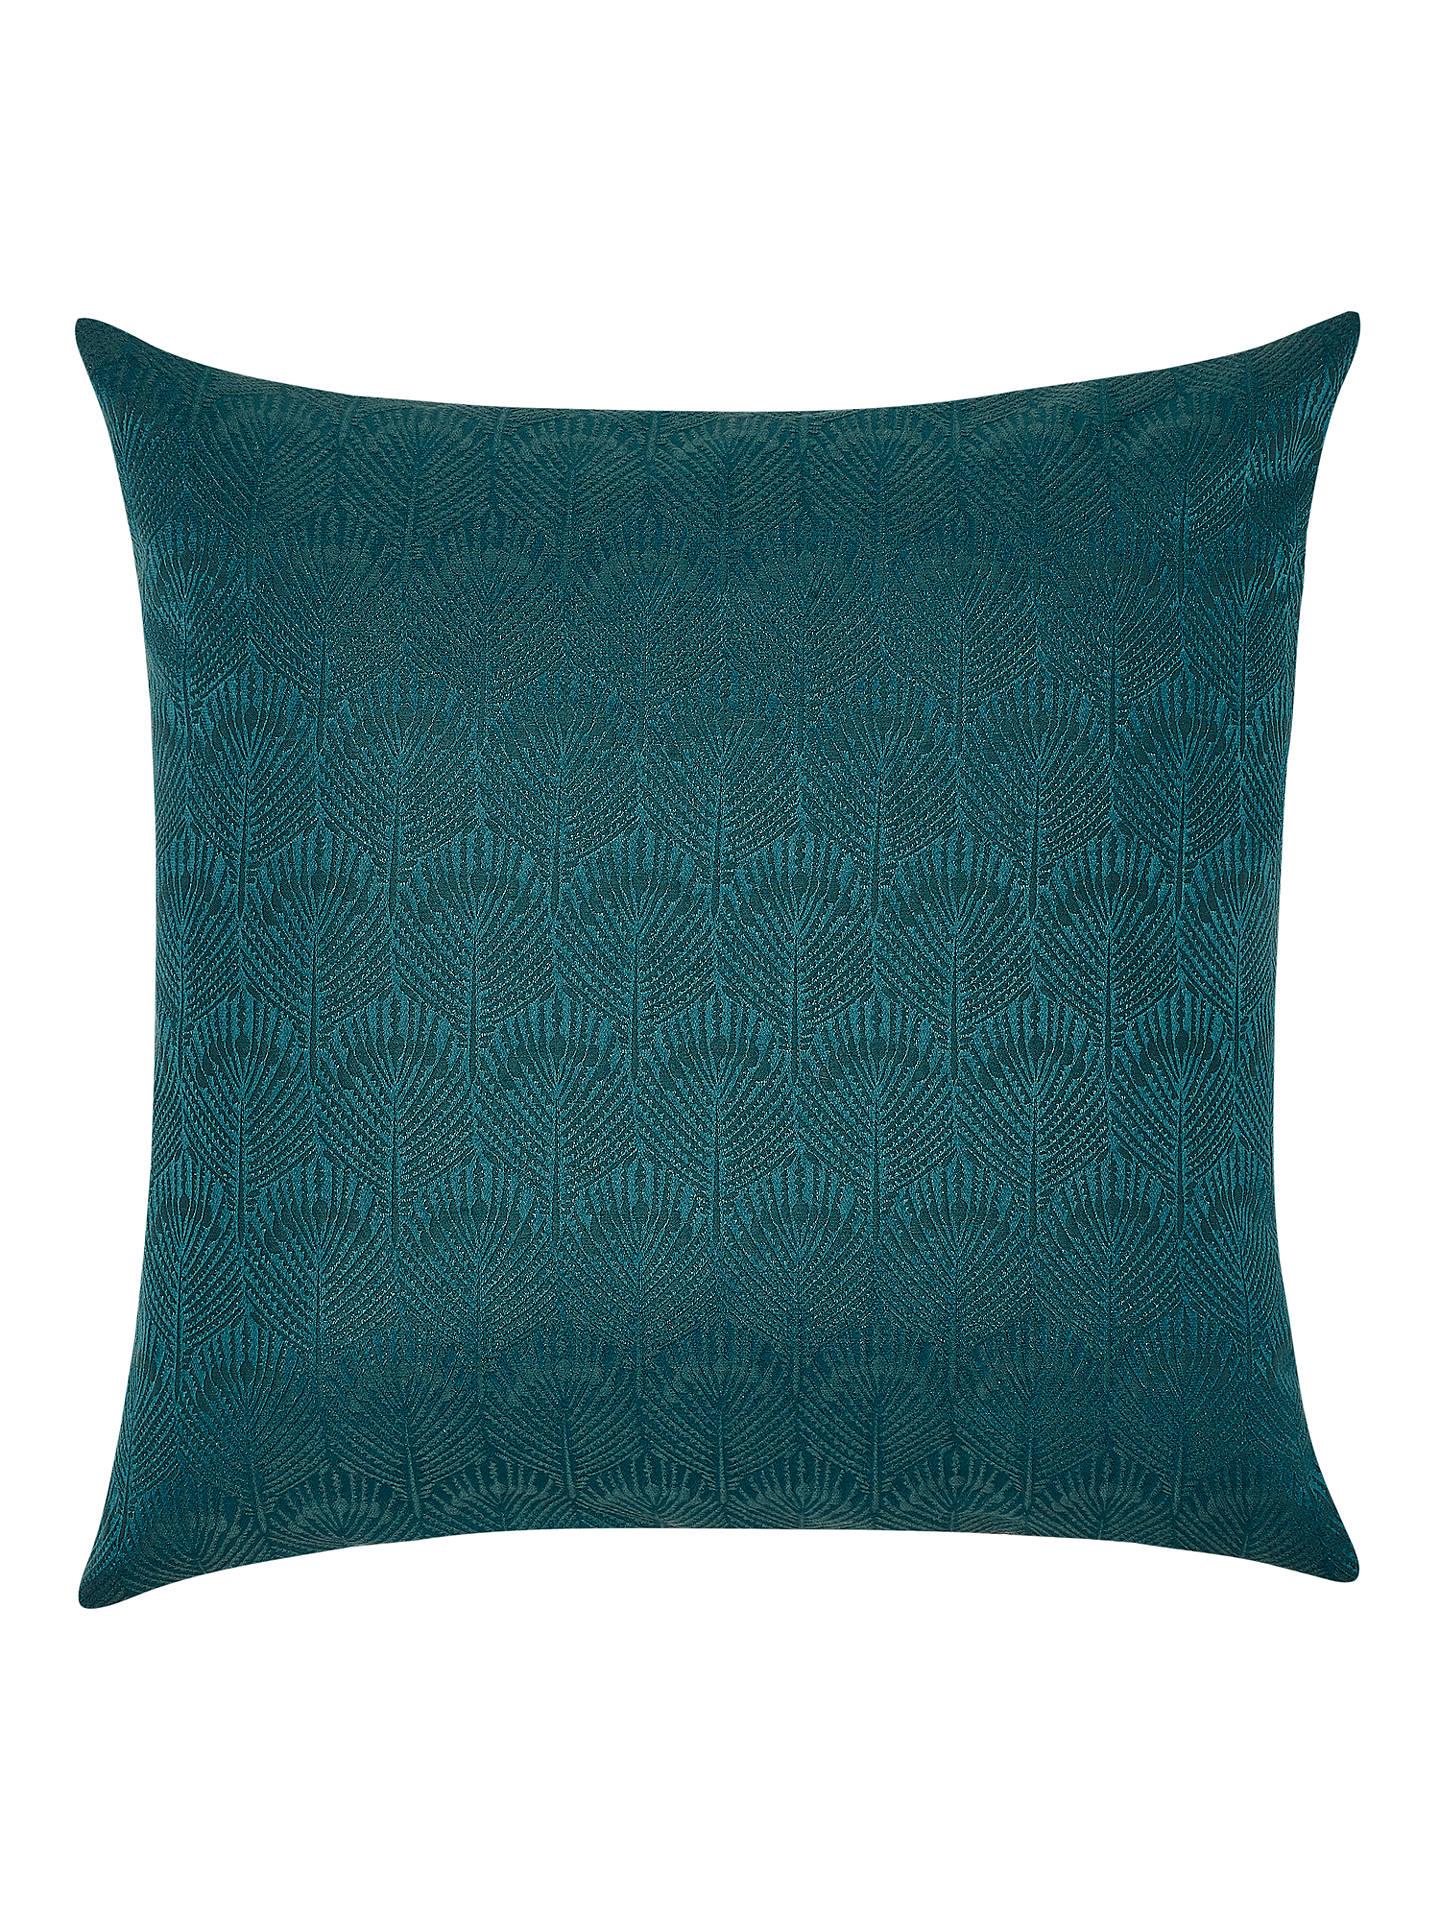 john lewis partners pavone cushion teal at john lewis. Black Bedroom Furniture Sets. Home Design Ideas